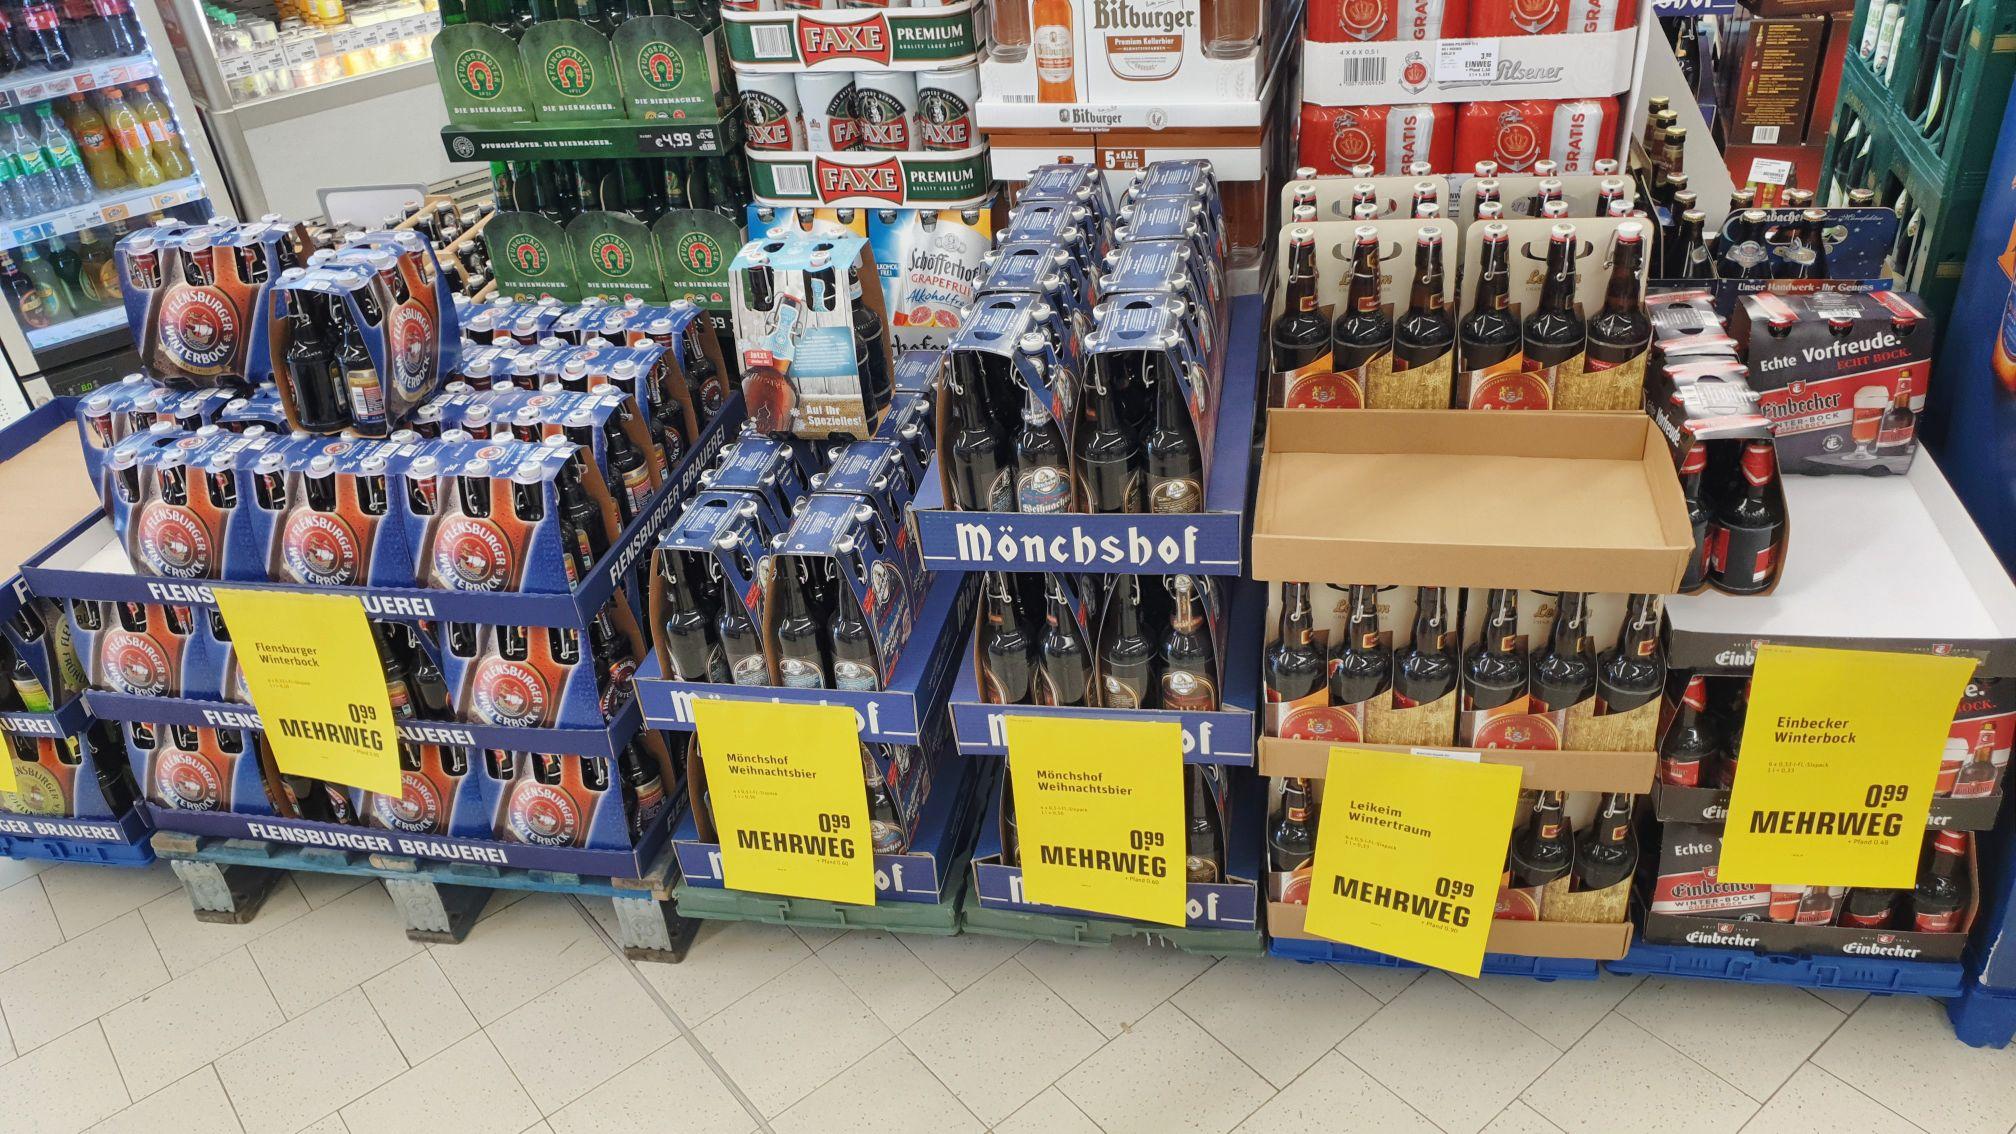 [Lokal Wiesbaden] diverse 6x0.33 Liter Bier Abverkauf